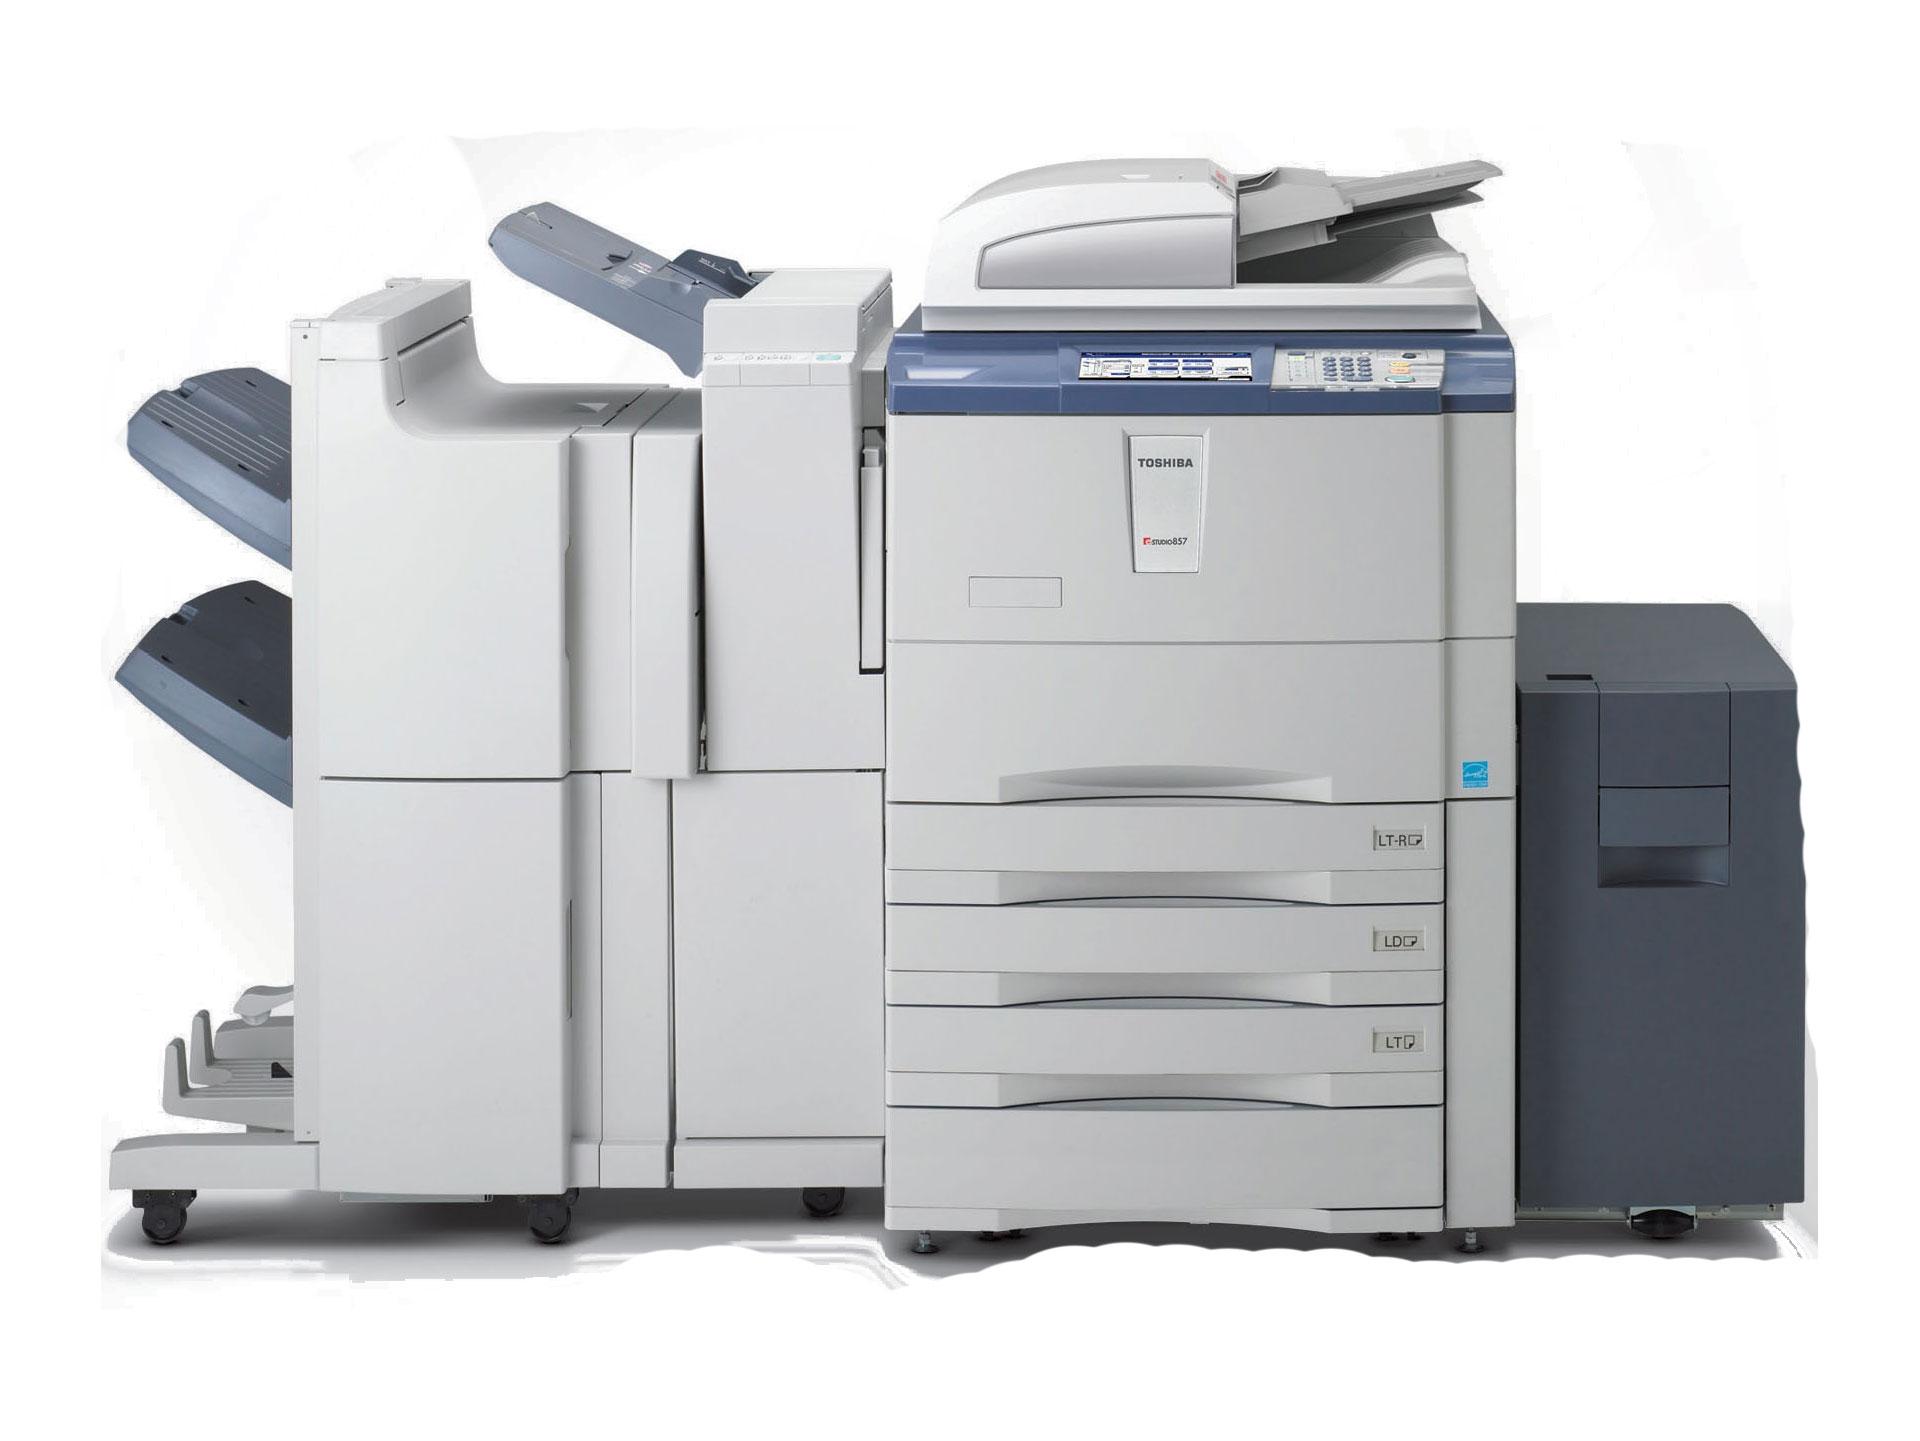 Fotocopiadora Toshiba e-STUDIO 657 Barata